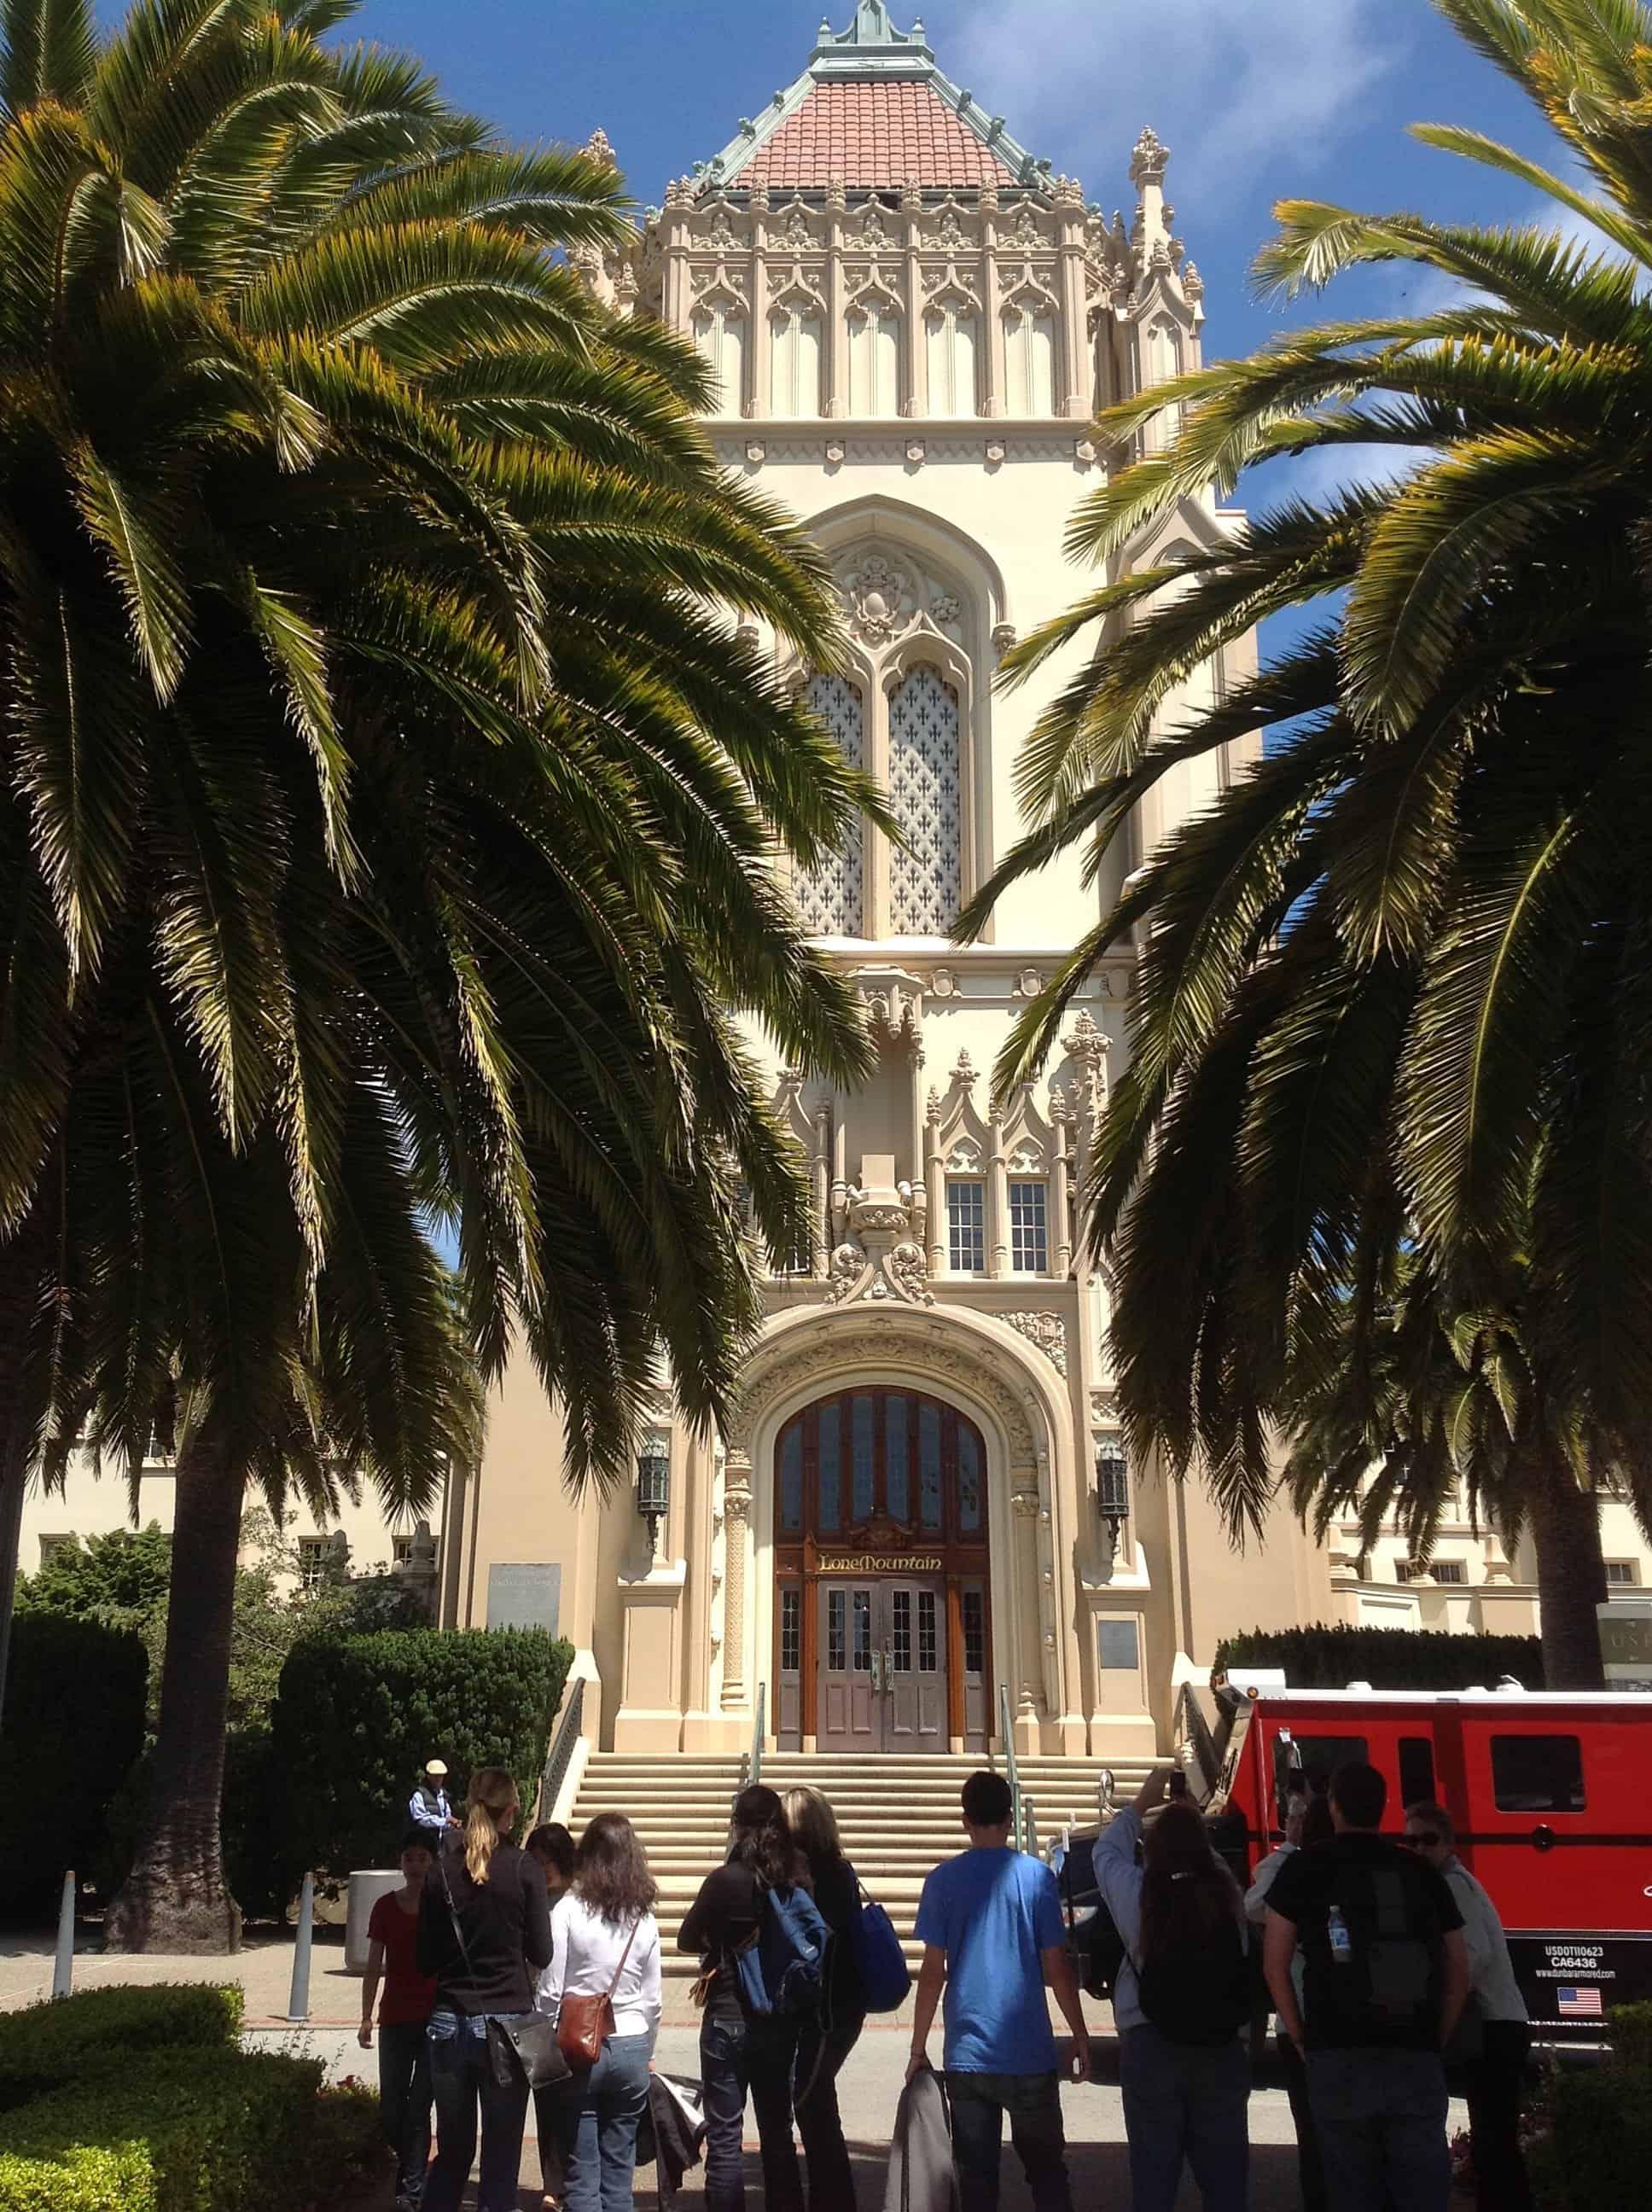 Santa Clara πανεπιστήμιο dating τα ραντεβού του Μπράντφορντ